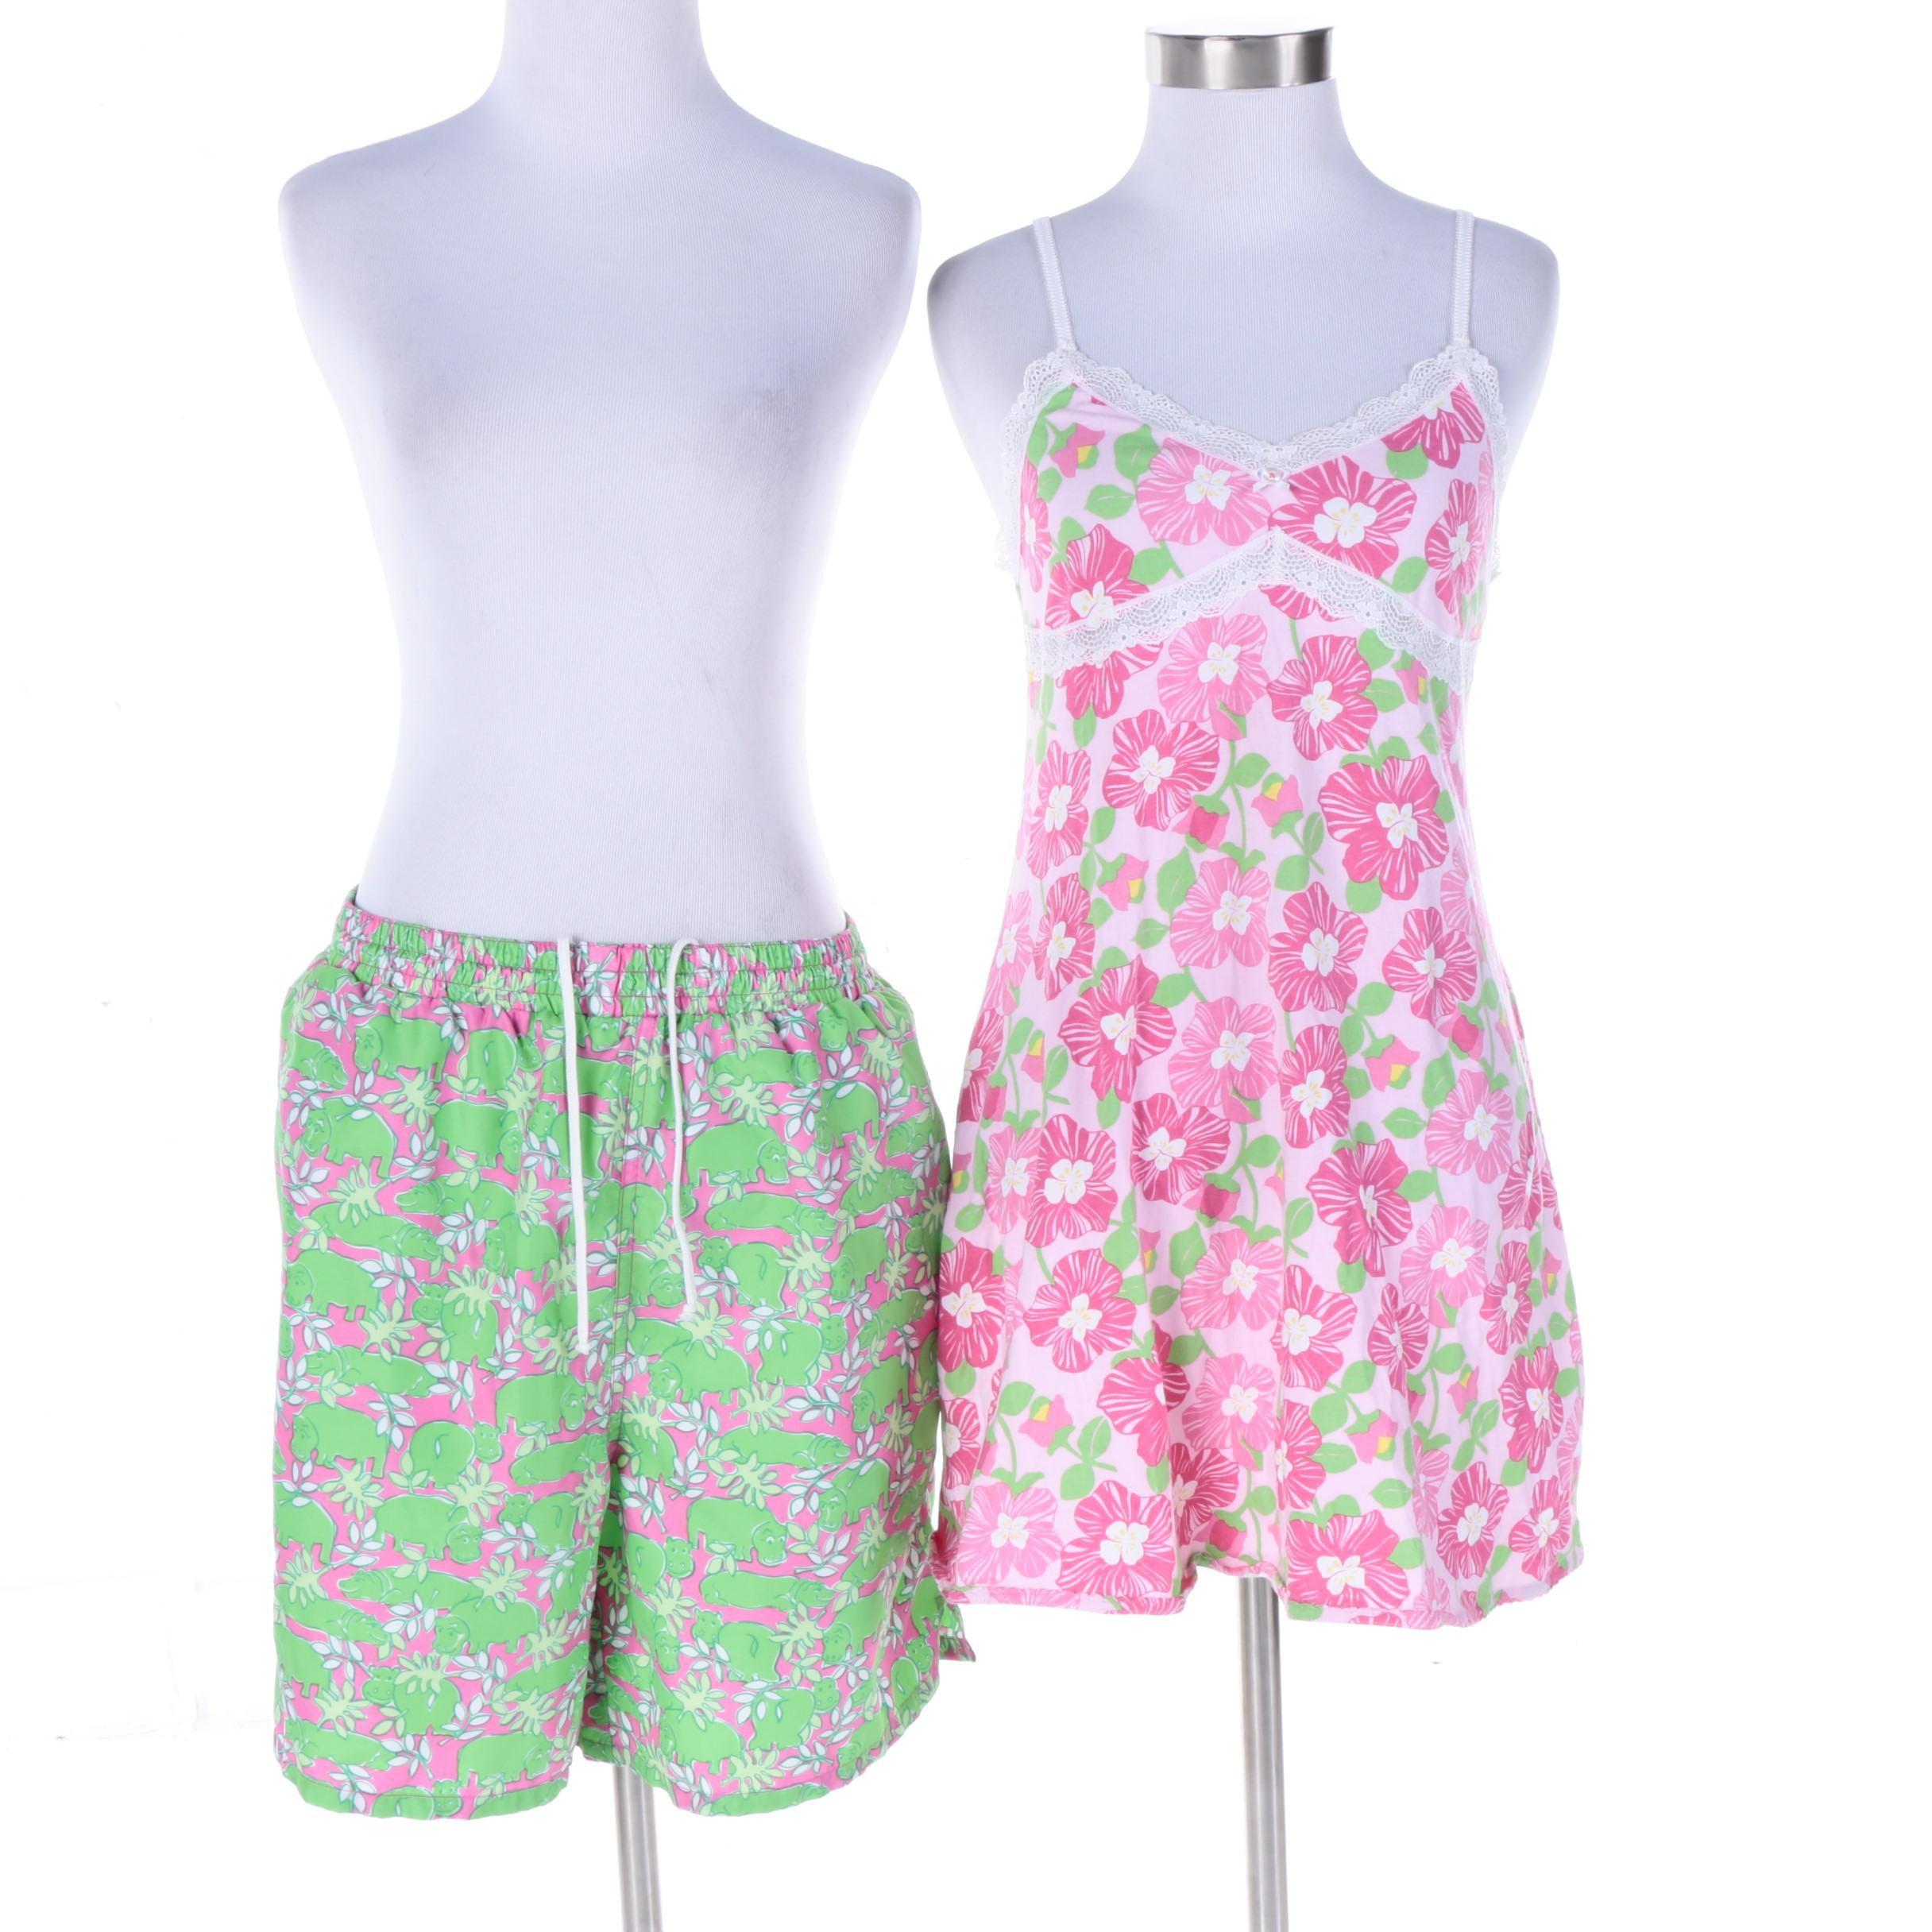 Lilly Pulitzer Shirt and Swimming Shorts